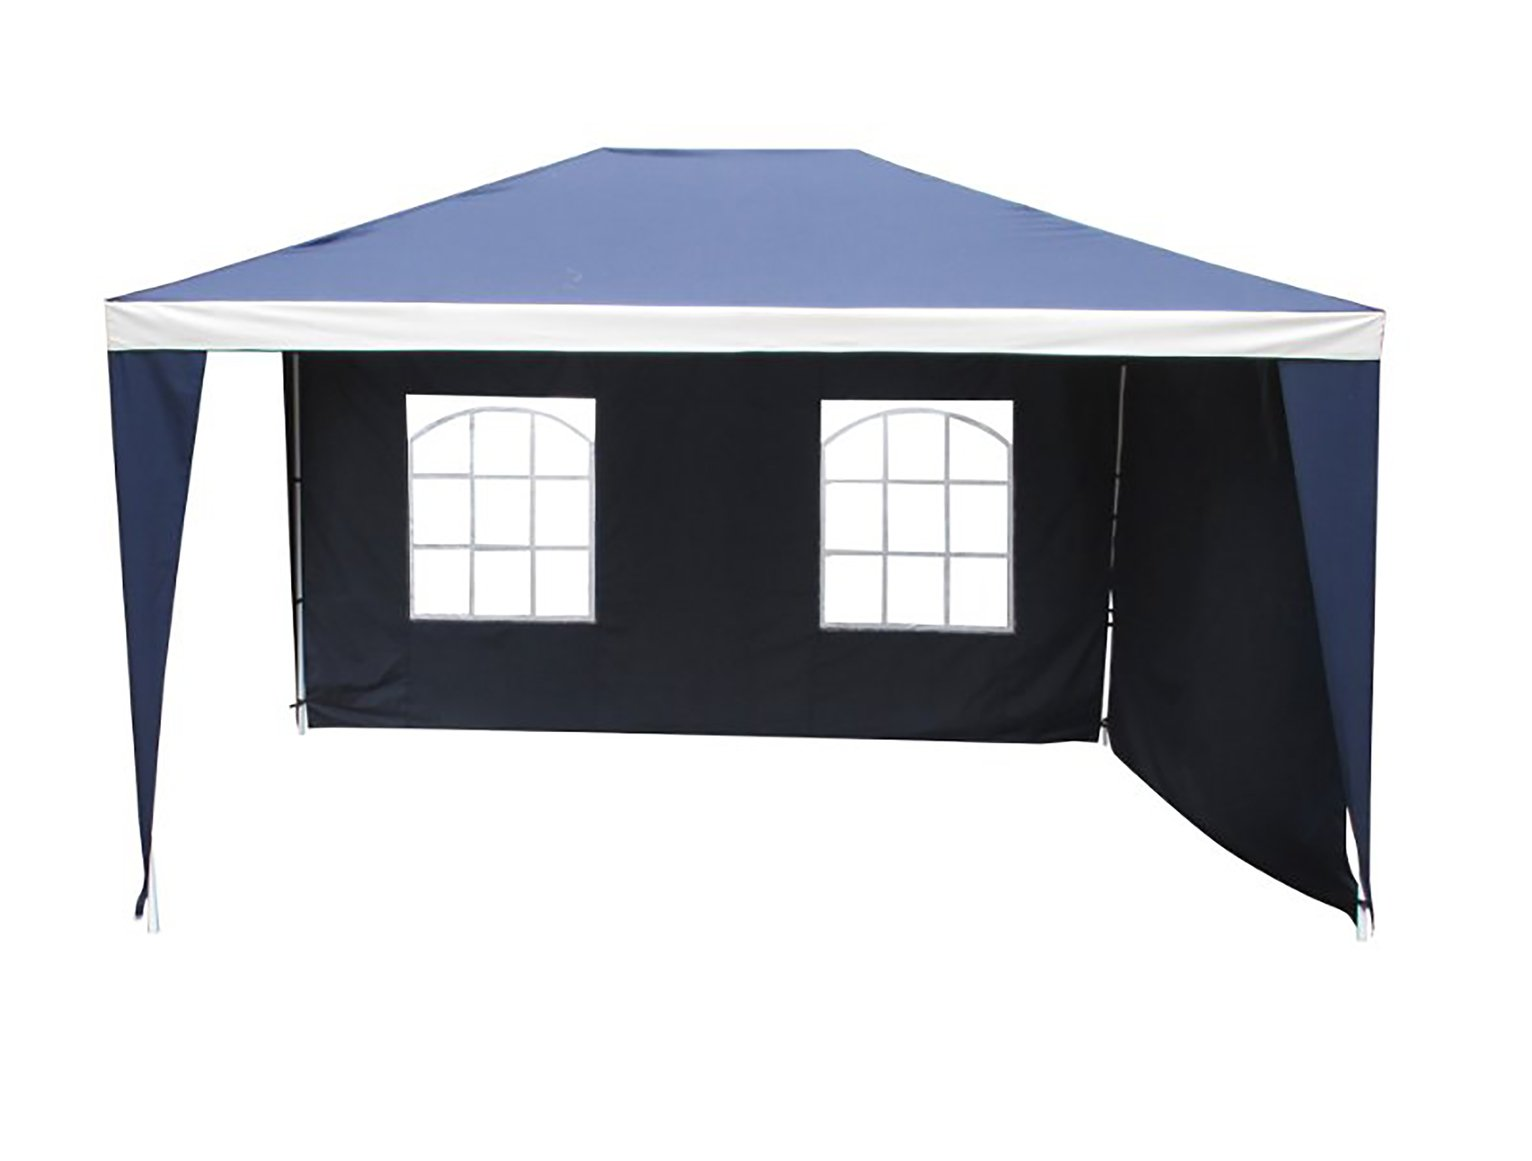 Argos Home - Waterproof 3m x - 4m Gazebo